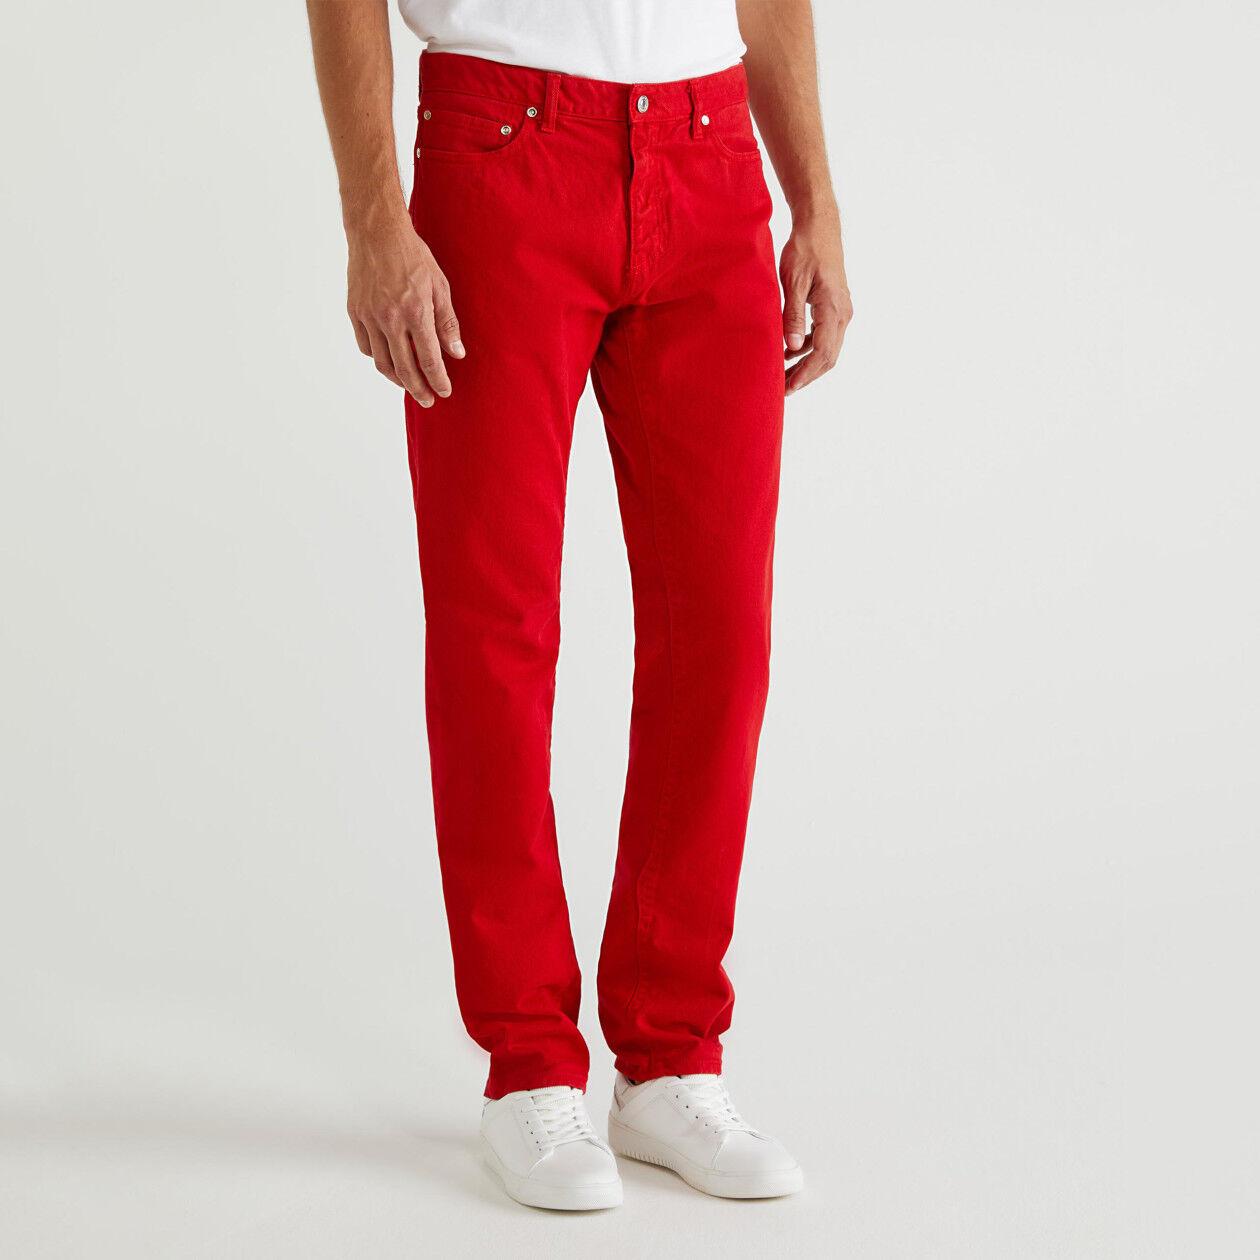 Five pocket pants